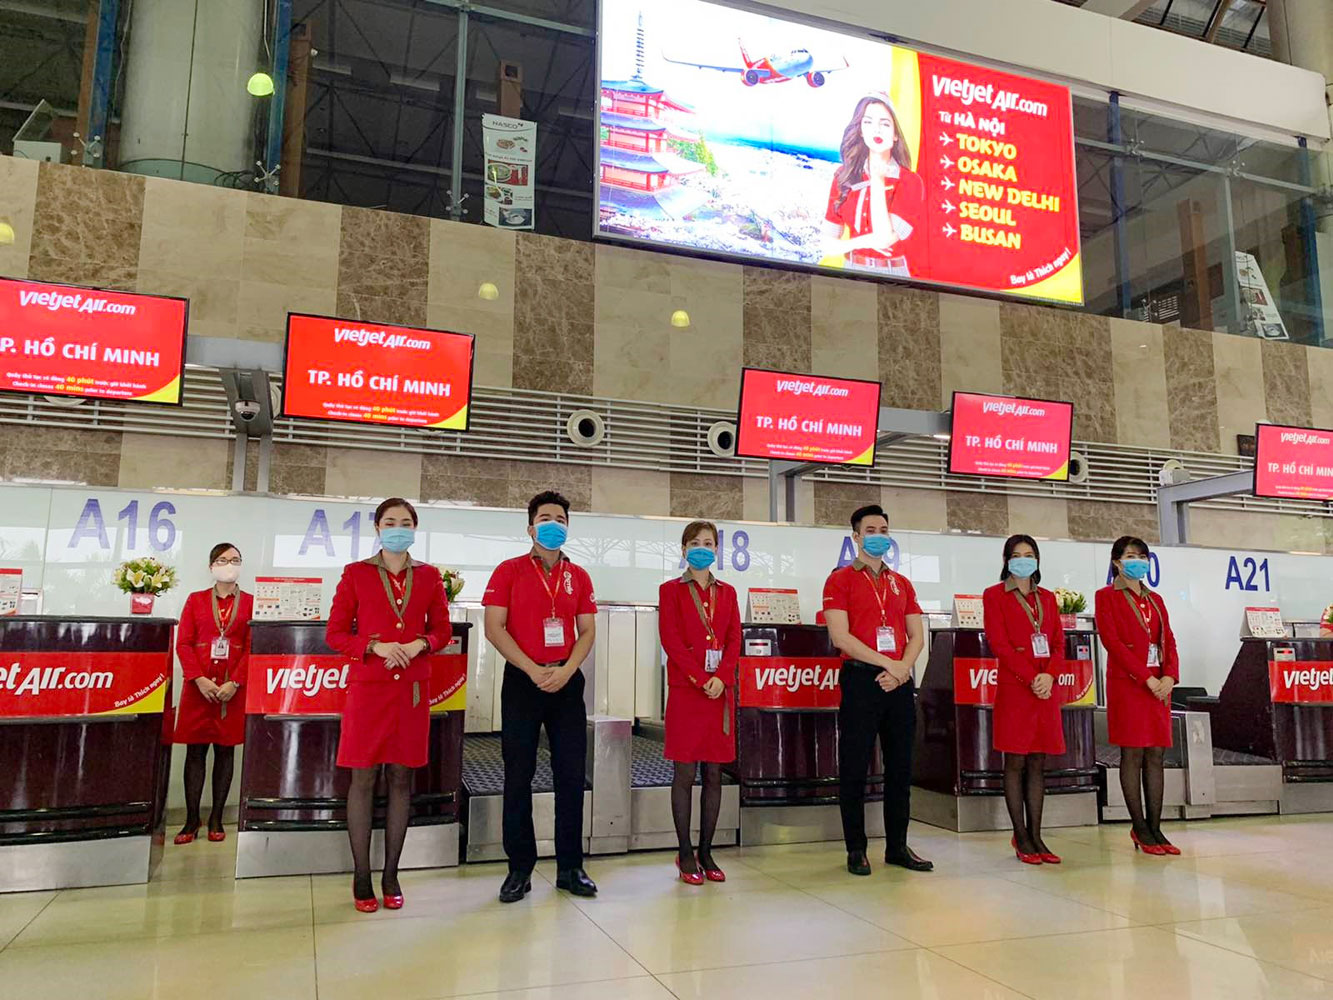 (Above: Vietjet's checkin counter at Noi Bai International Airport)